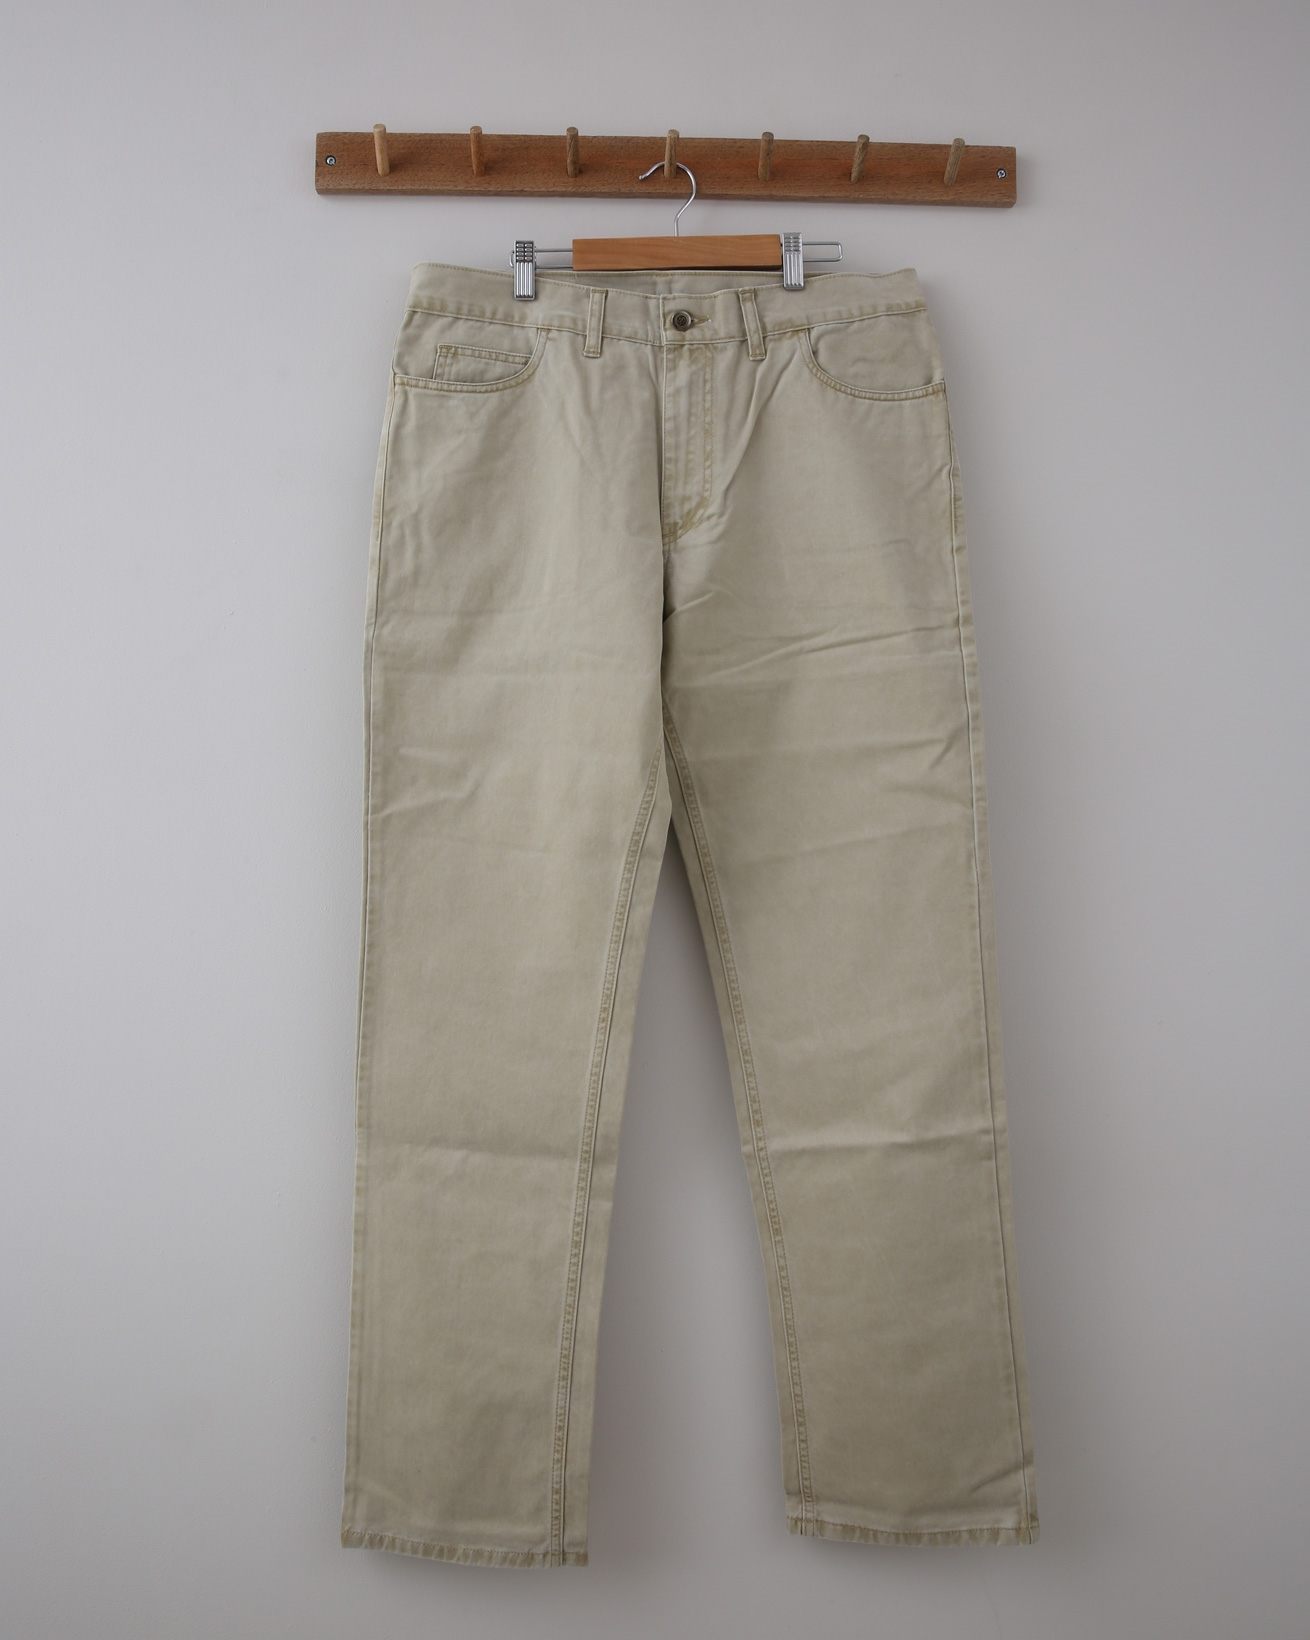 Mens Cotton Trouser - 34 Regular - Sahara Sand - 1358